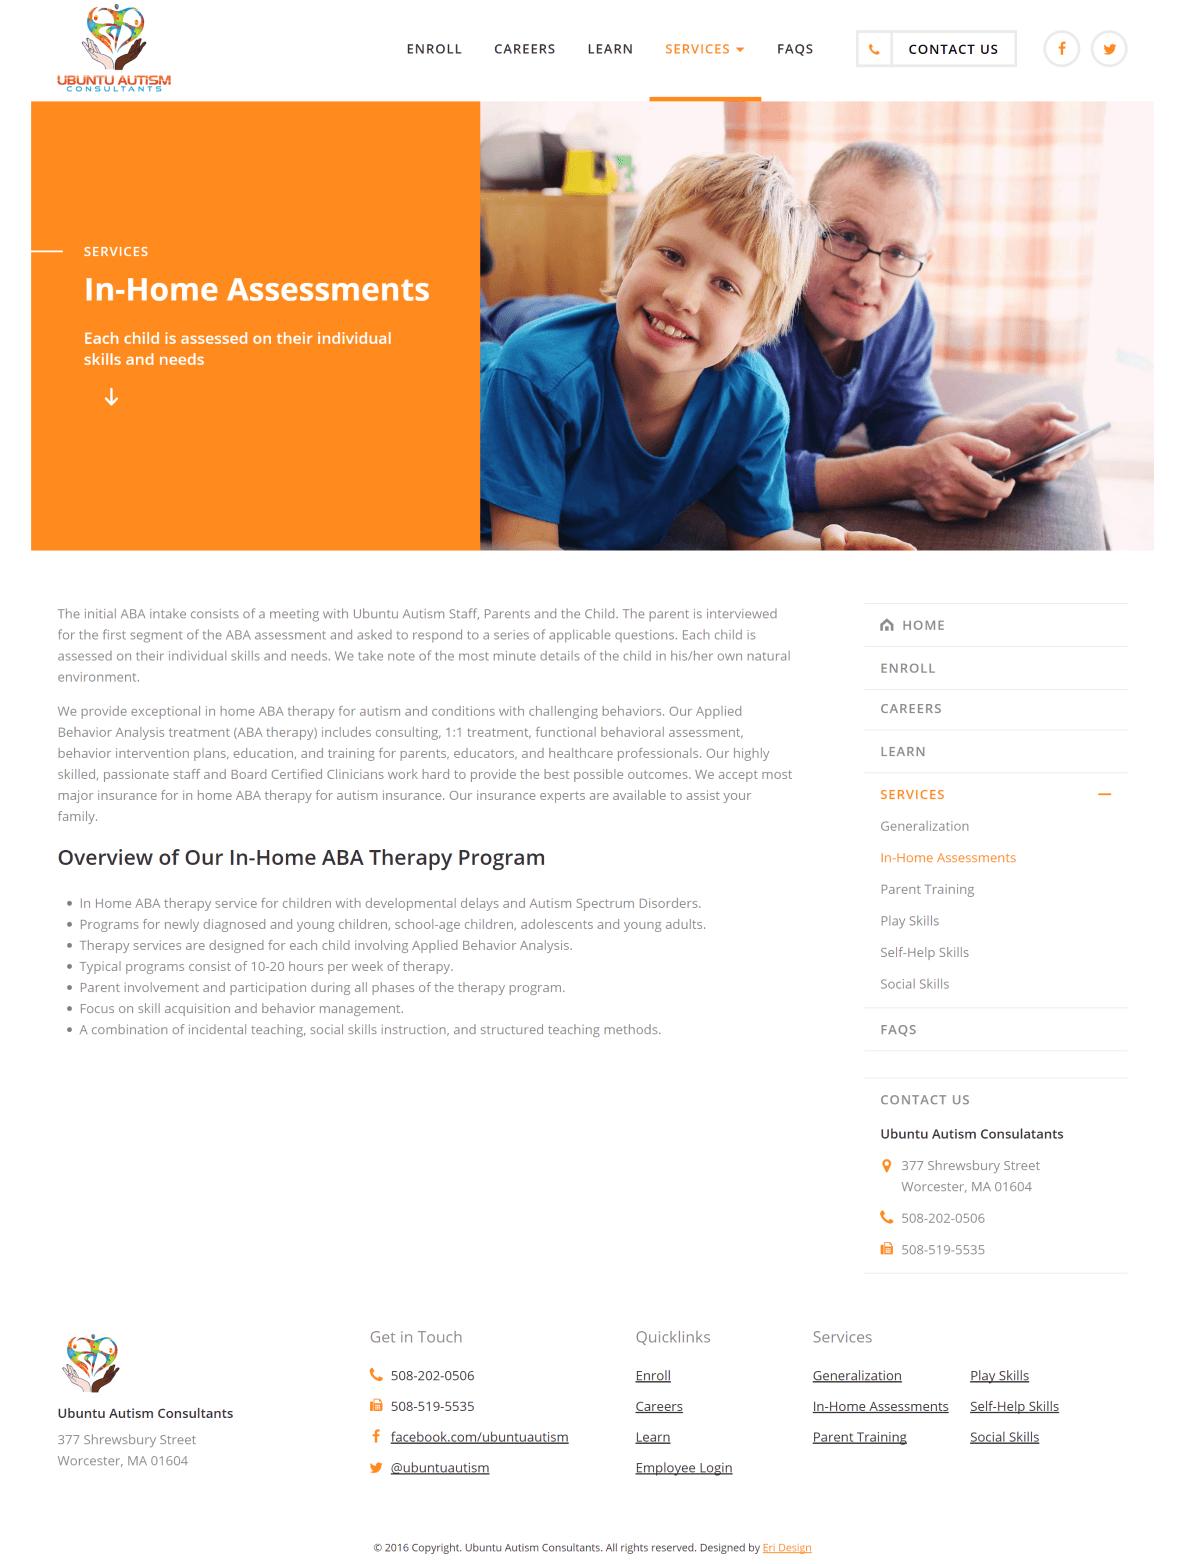 Ubuntu Autism Service Page